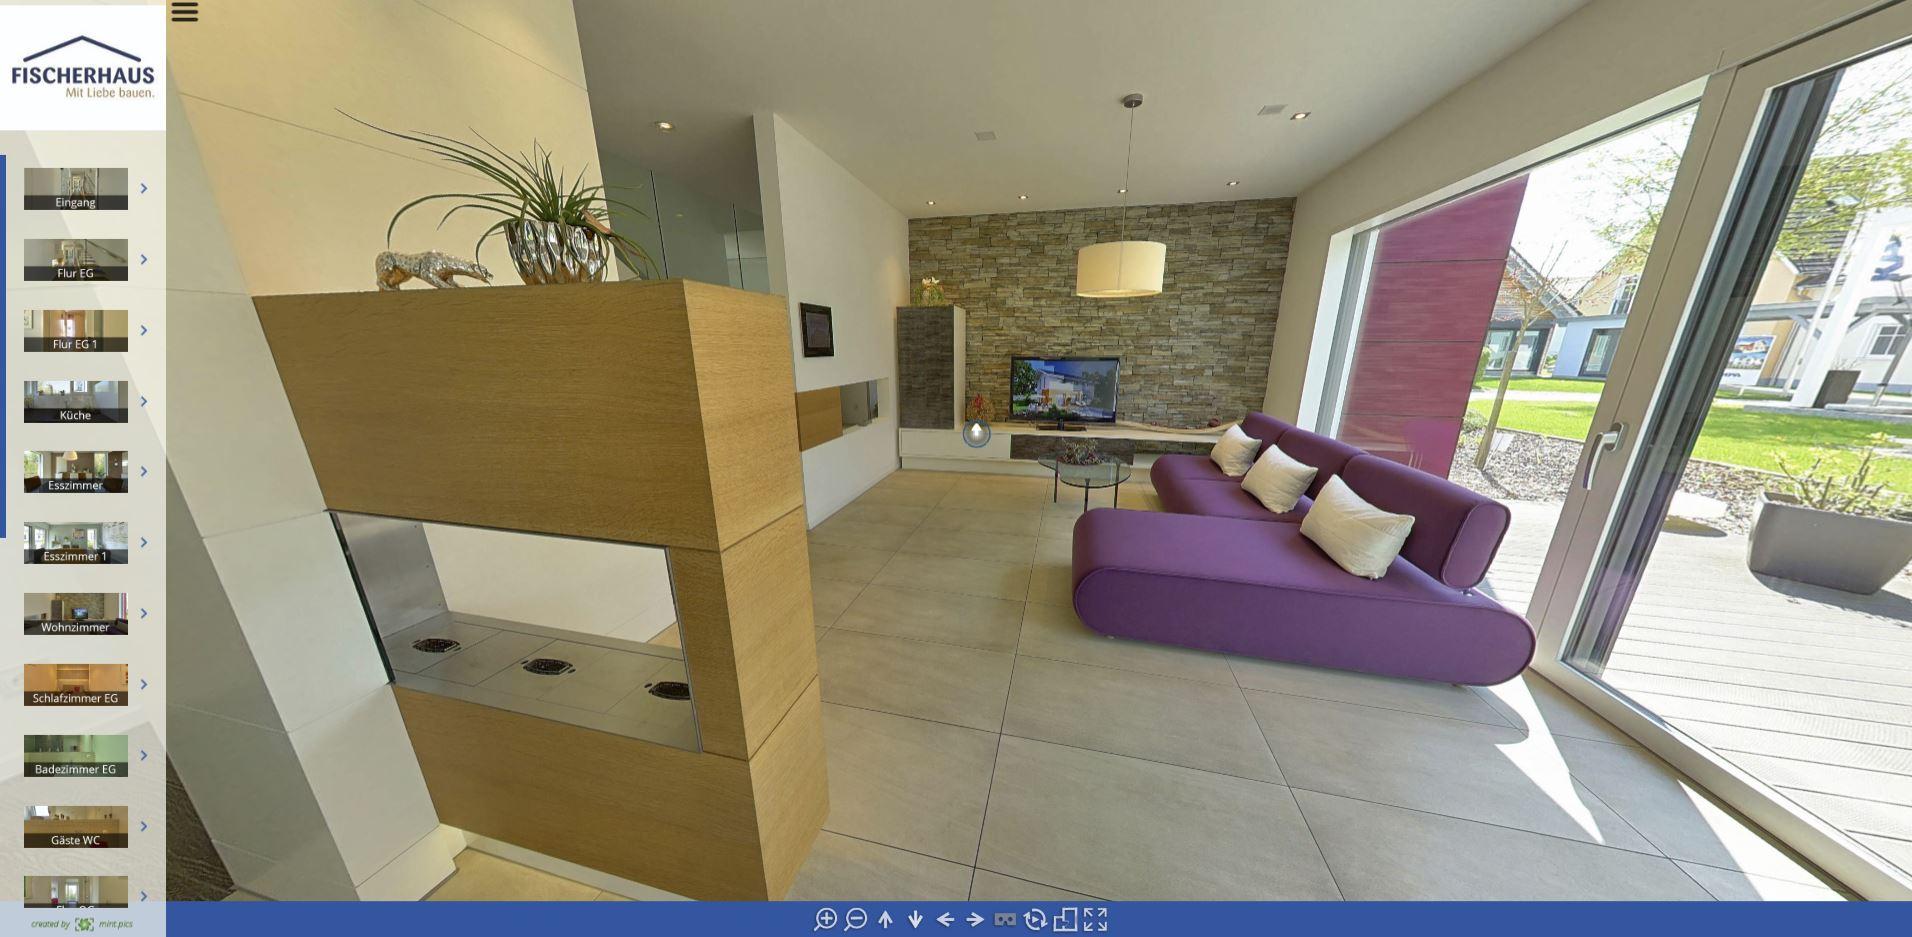 energie plus haus generation x m nchen fischerhaus gmbh co kg musterhaus online. Black Bedroom Furniture Sets. Home Design Ideas